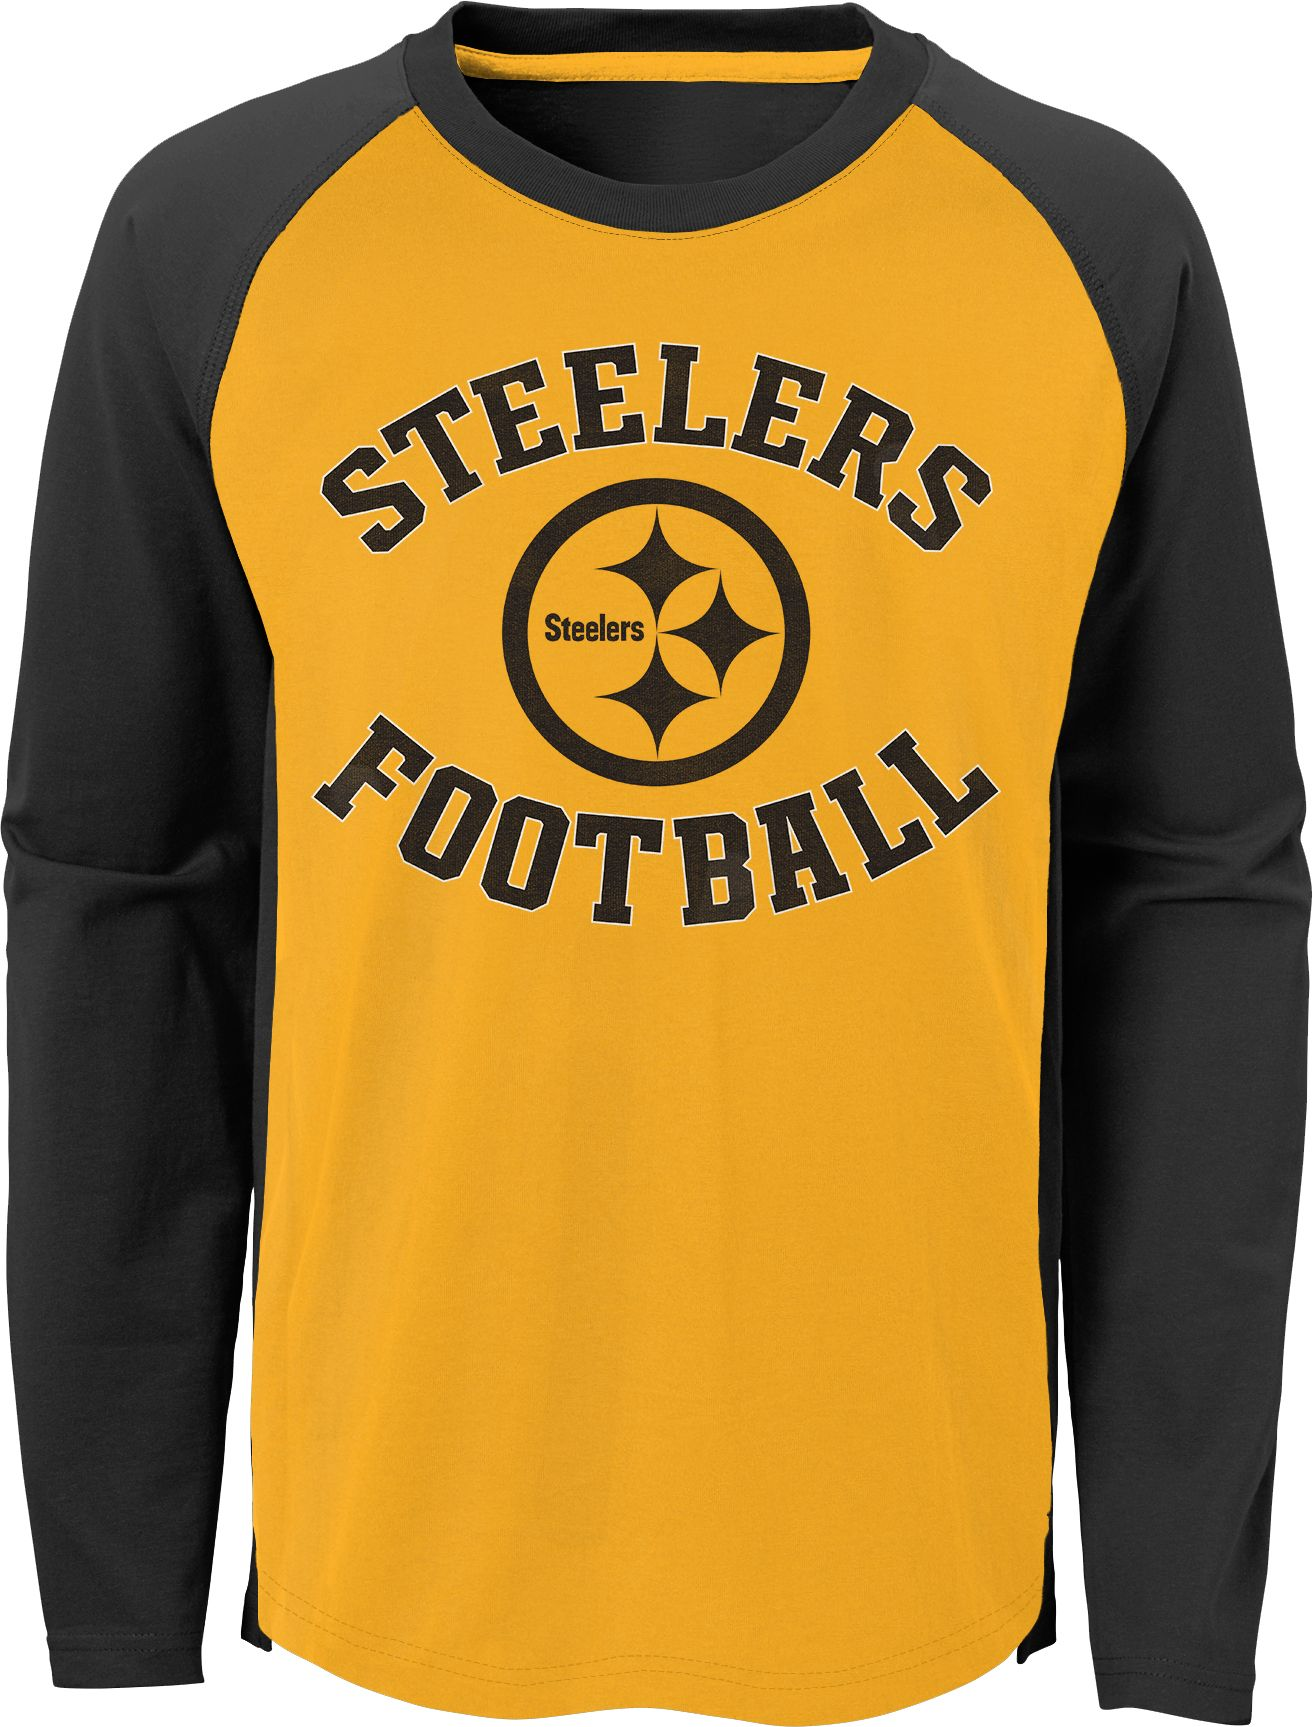 pittsburgh steelers long sleeve jersey